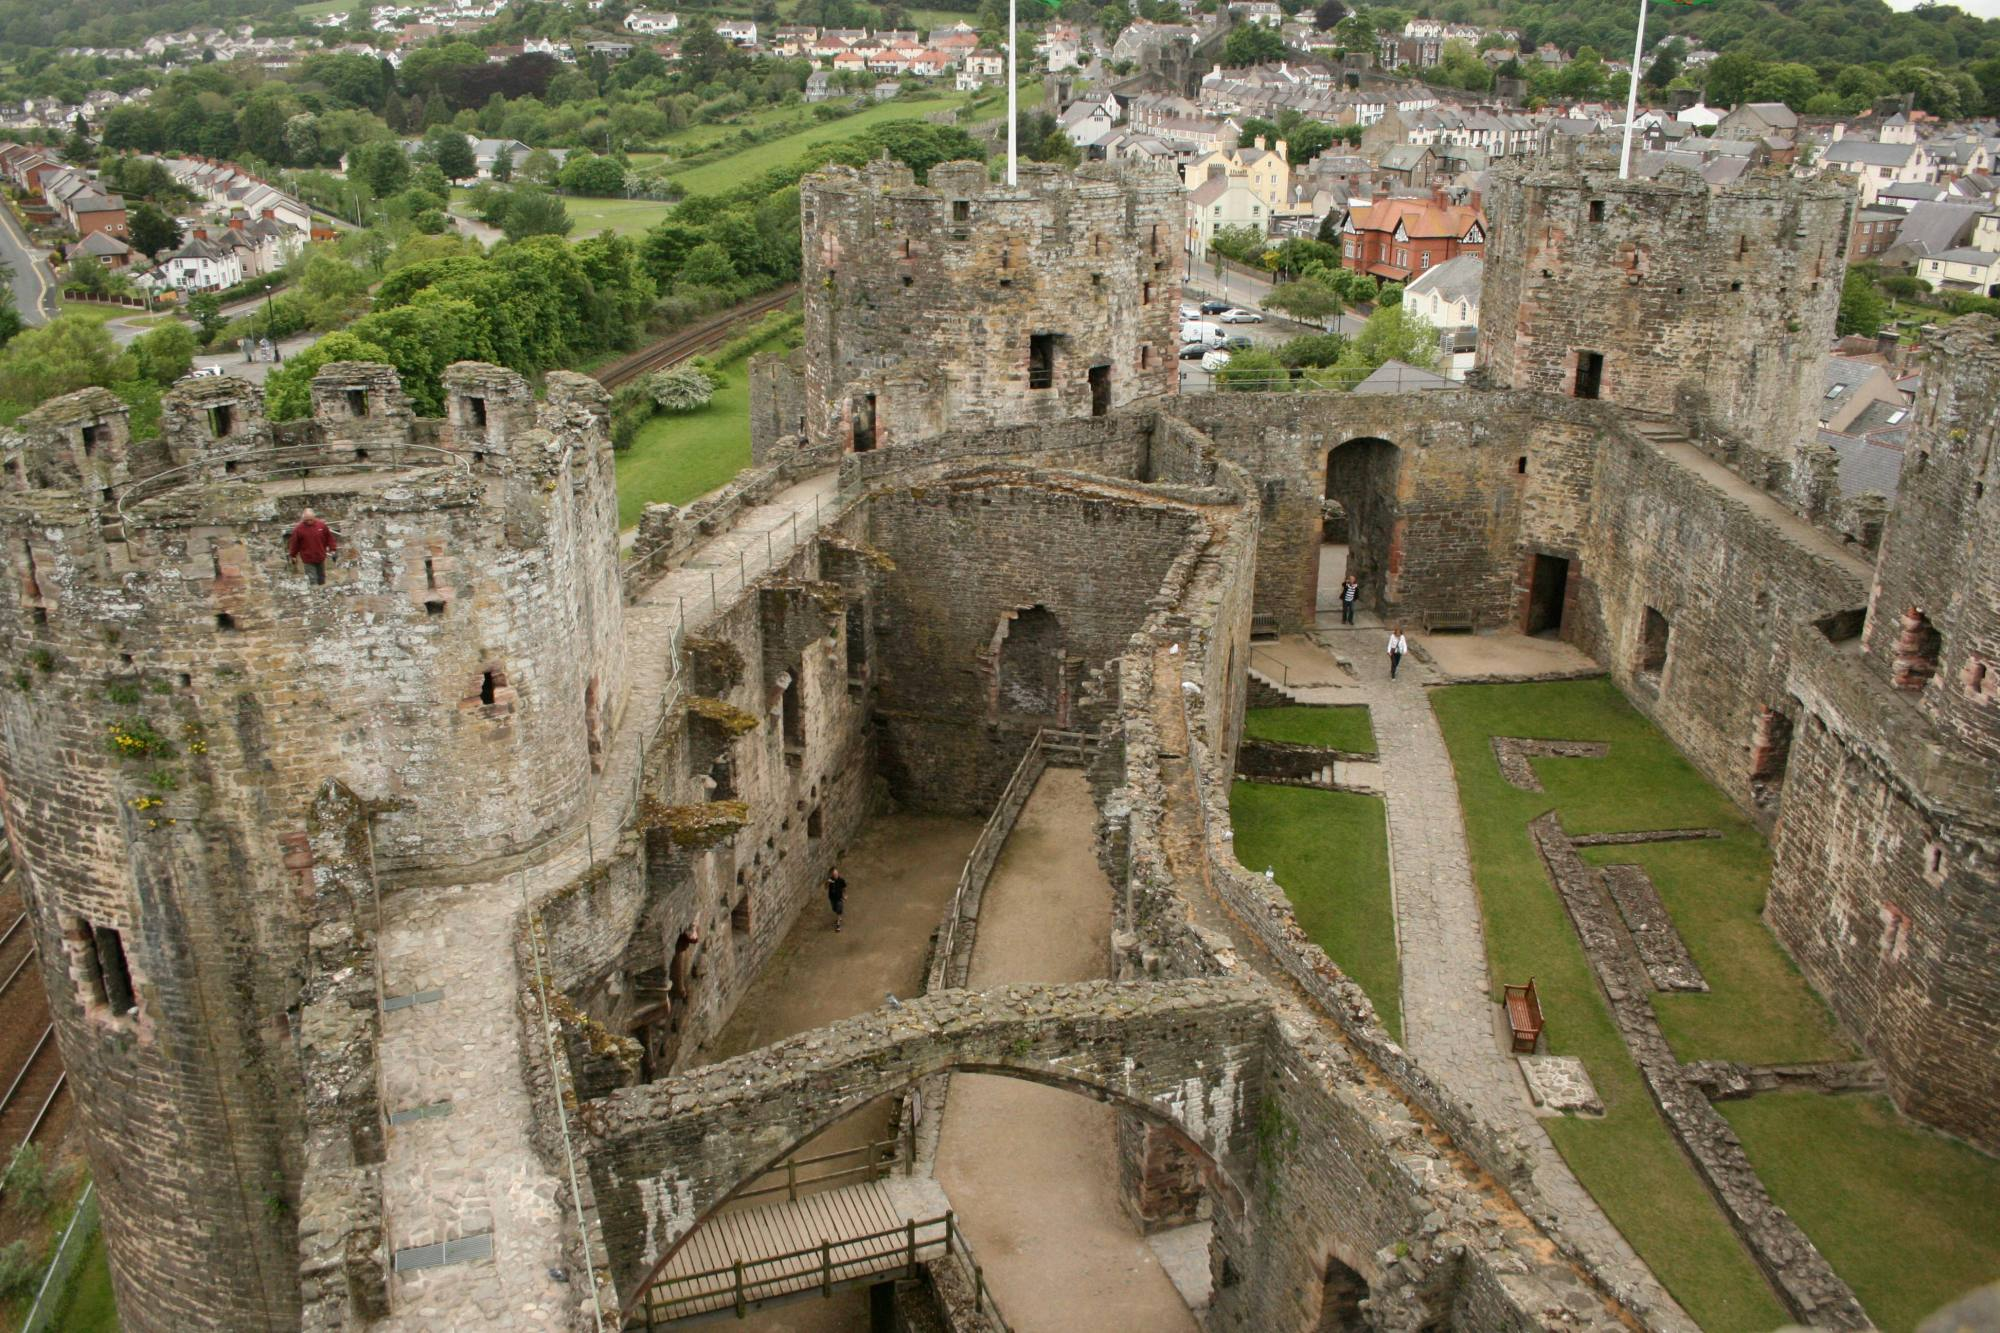 Conwy Castle, Conwy, Wales, north Wales, travel, photography, travel photography, castles of wales